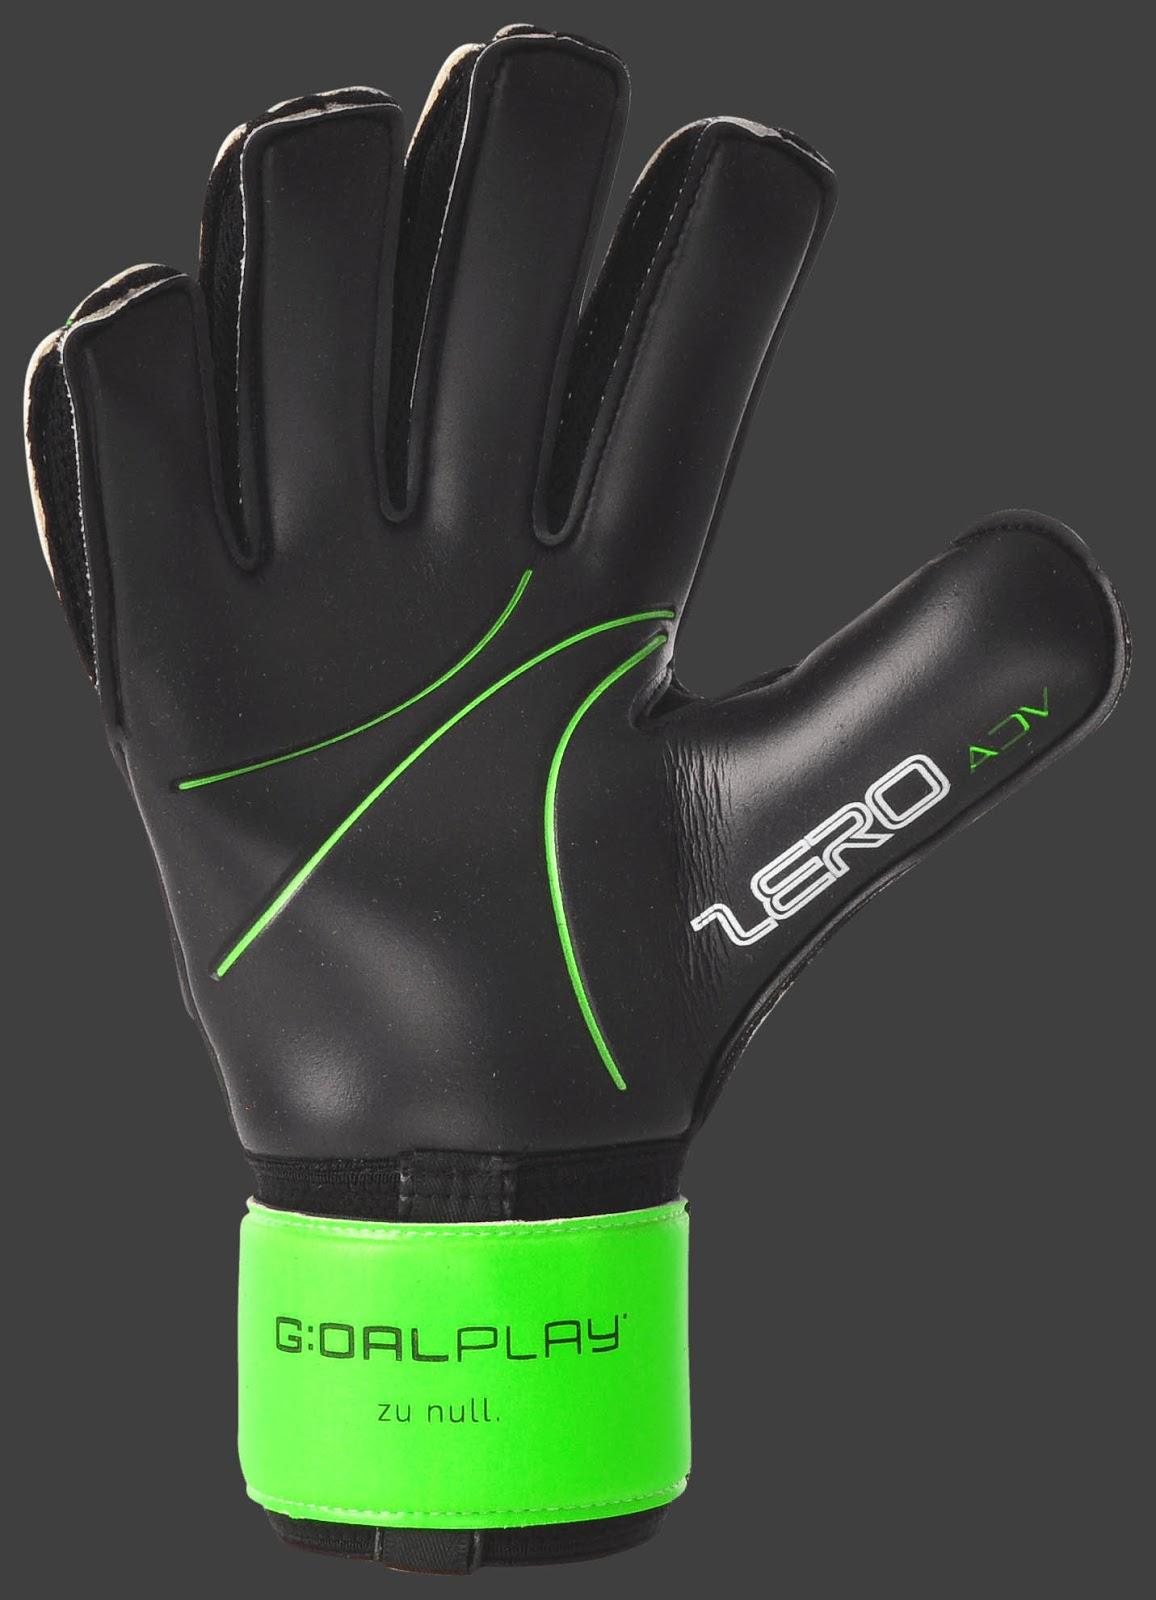 goodbye-adidas-oliver-kahn-launches-goalkeeper-brand-palm